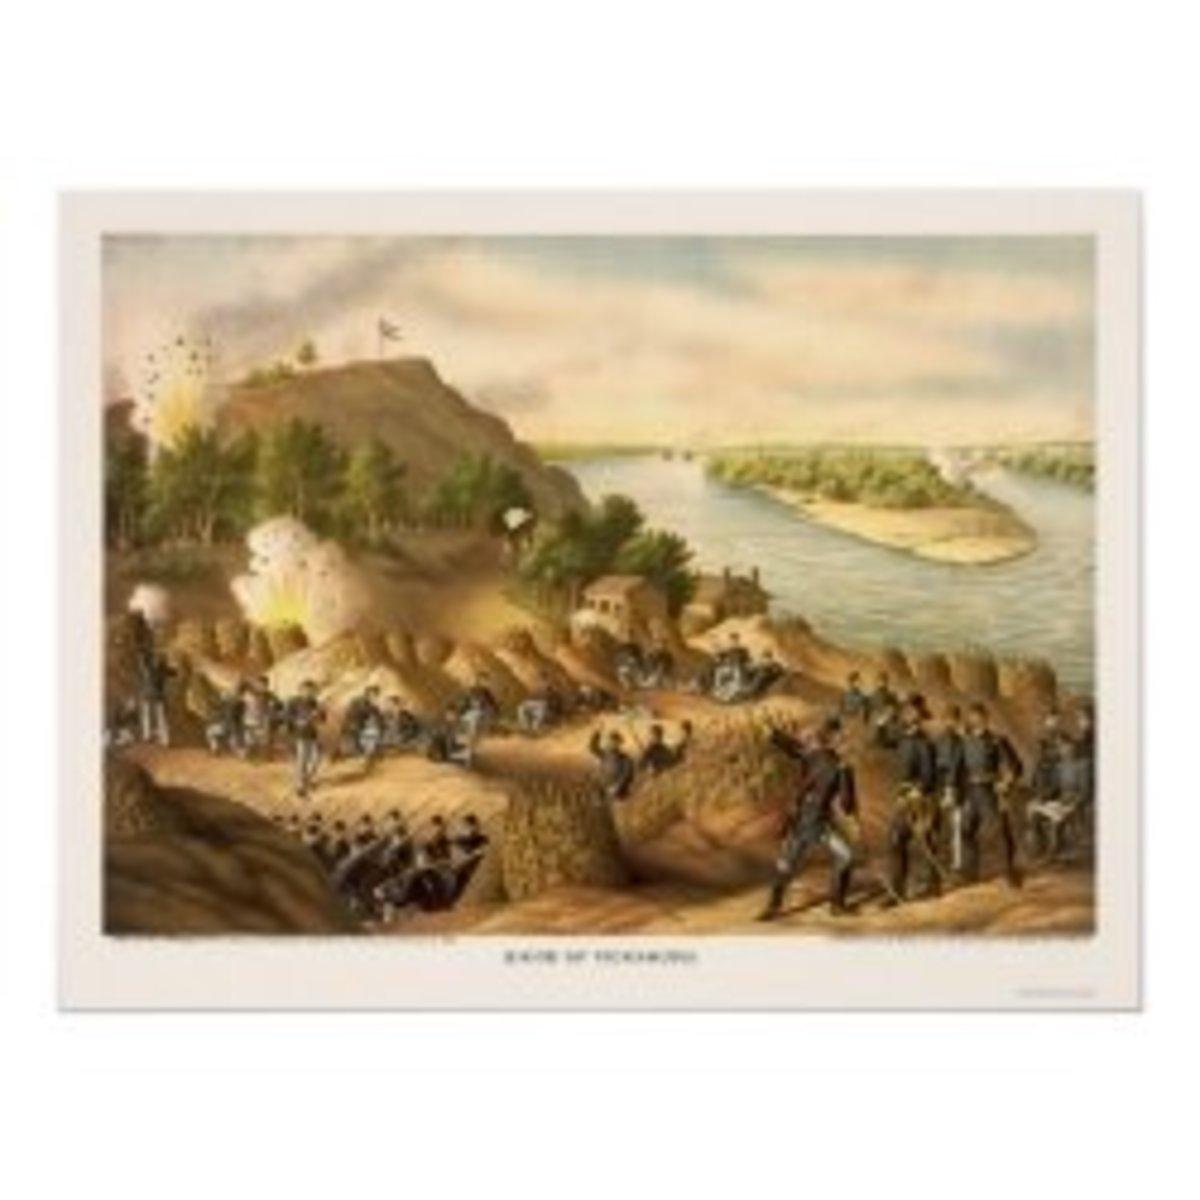 Siege of Vicksburg by Kurz and Allison 1863